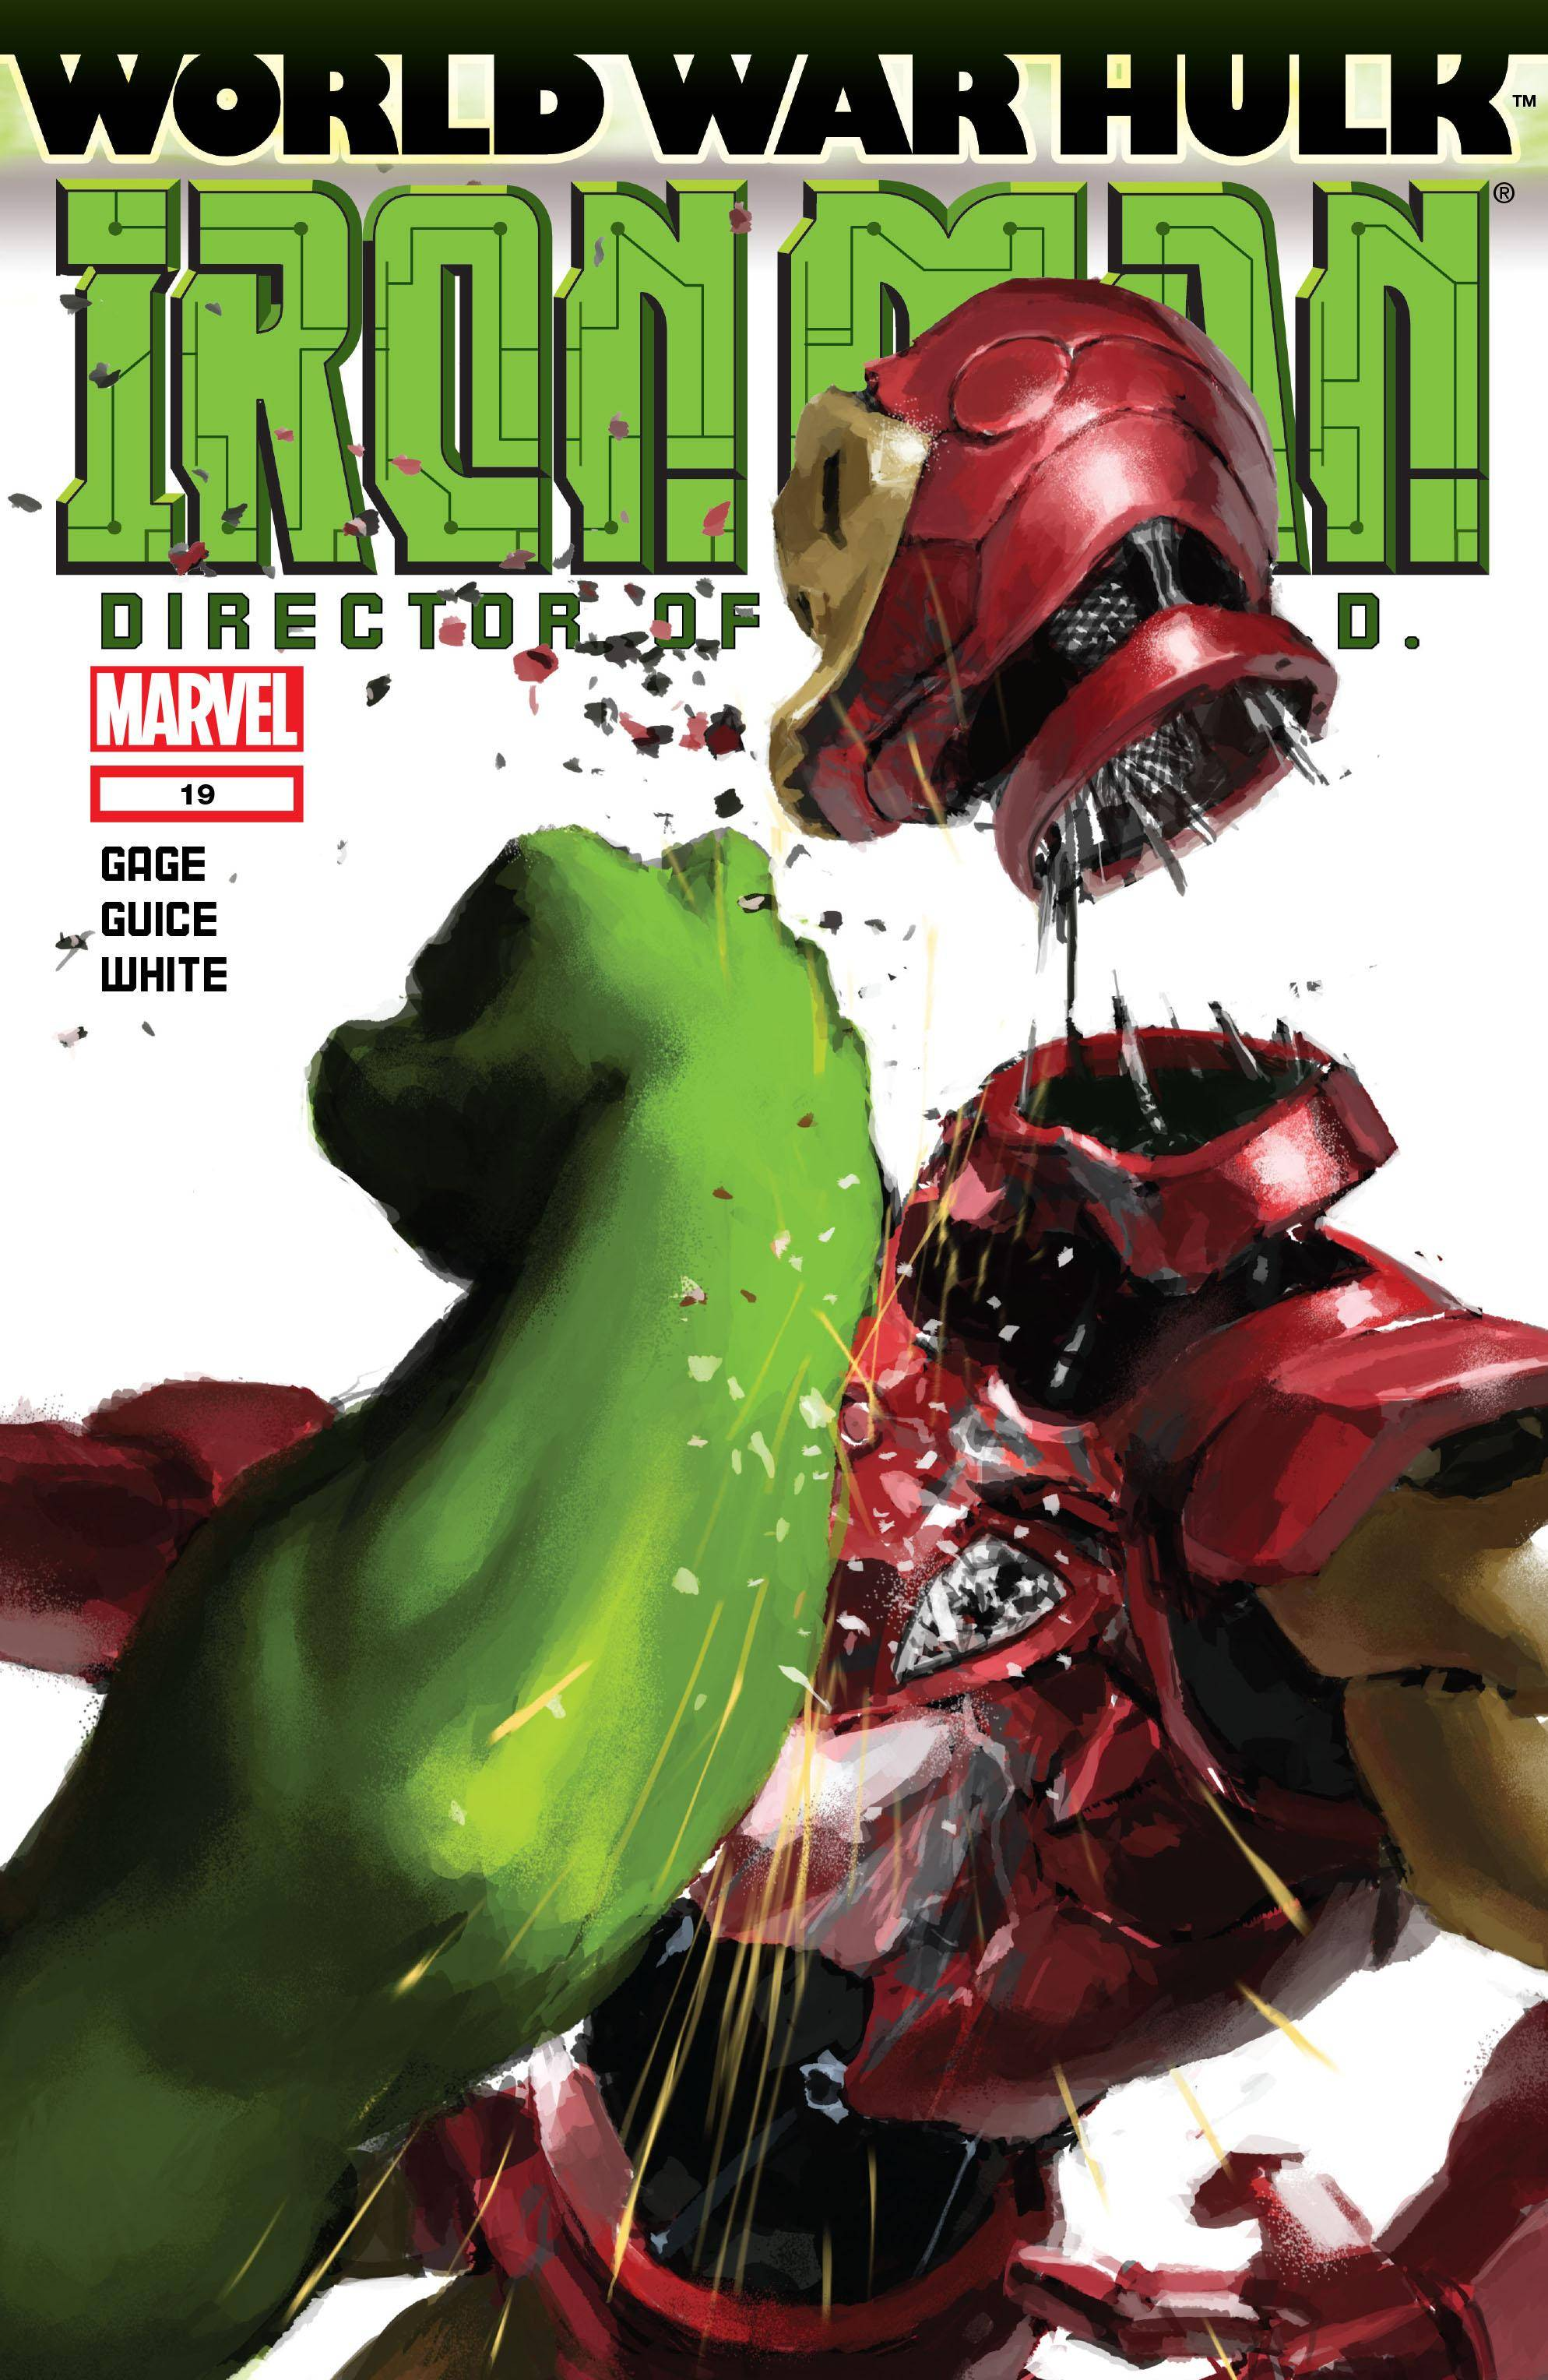 New Releases 2015 2 25 Iron Man Director of S H I E L D  019 2007 digital hd Kleio Empire cbz